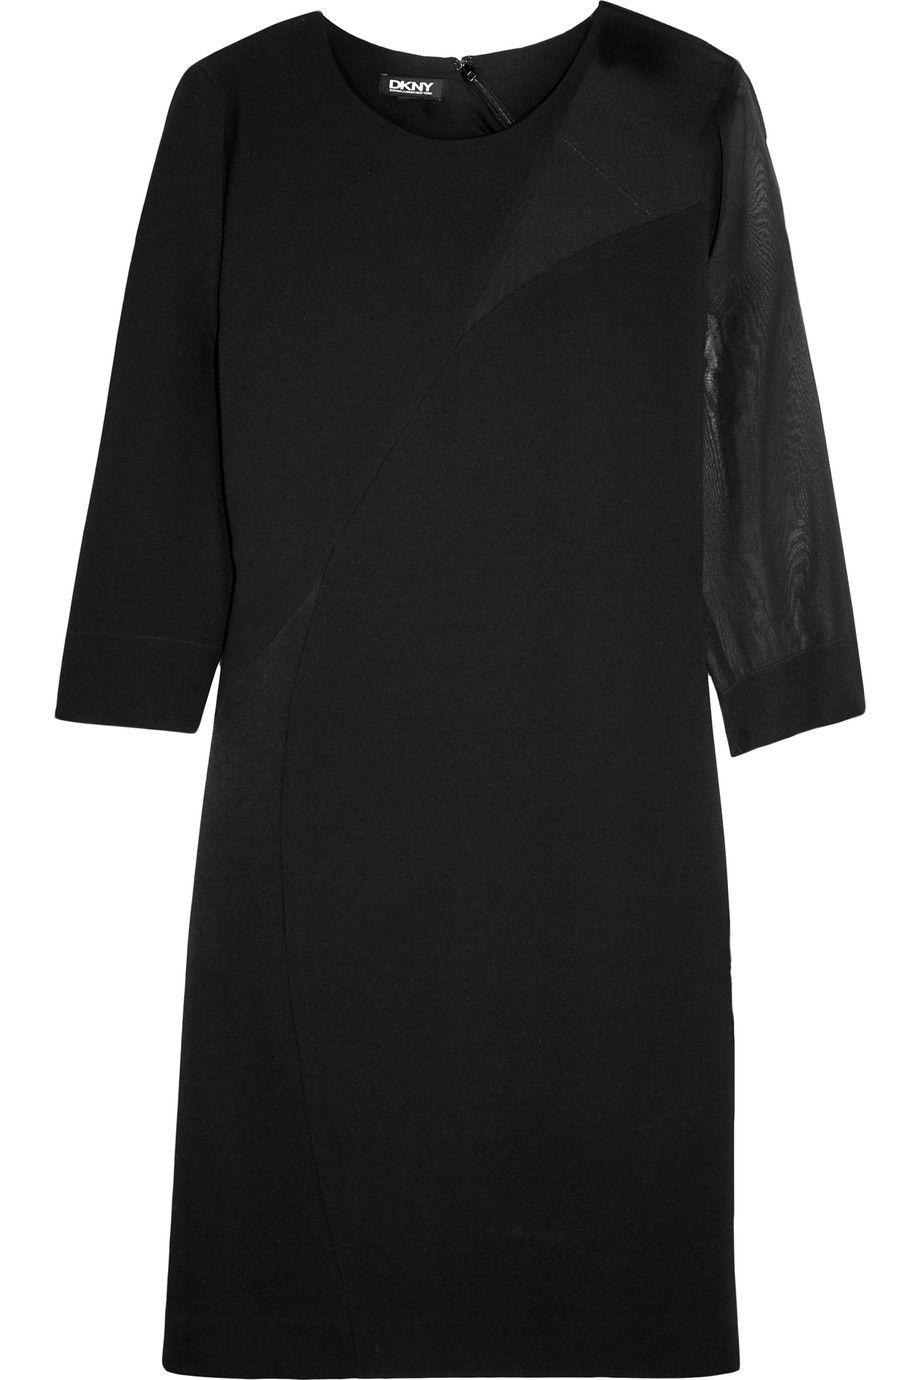 DKNY Chiffon-paneled crepe dress. #dkny #cloth #dress